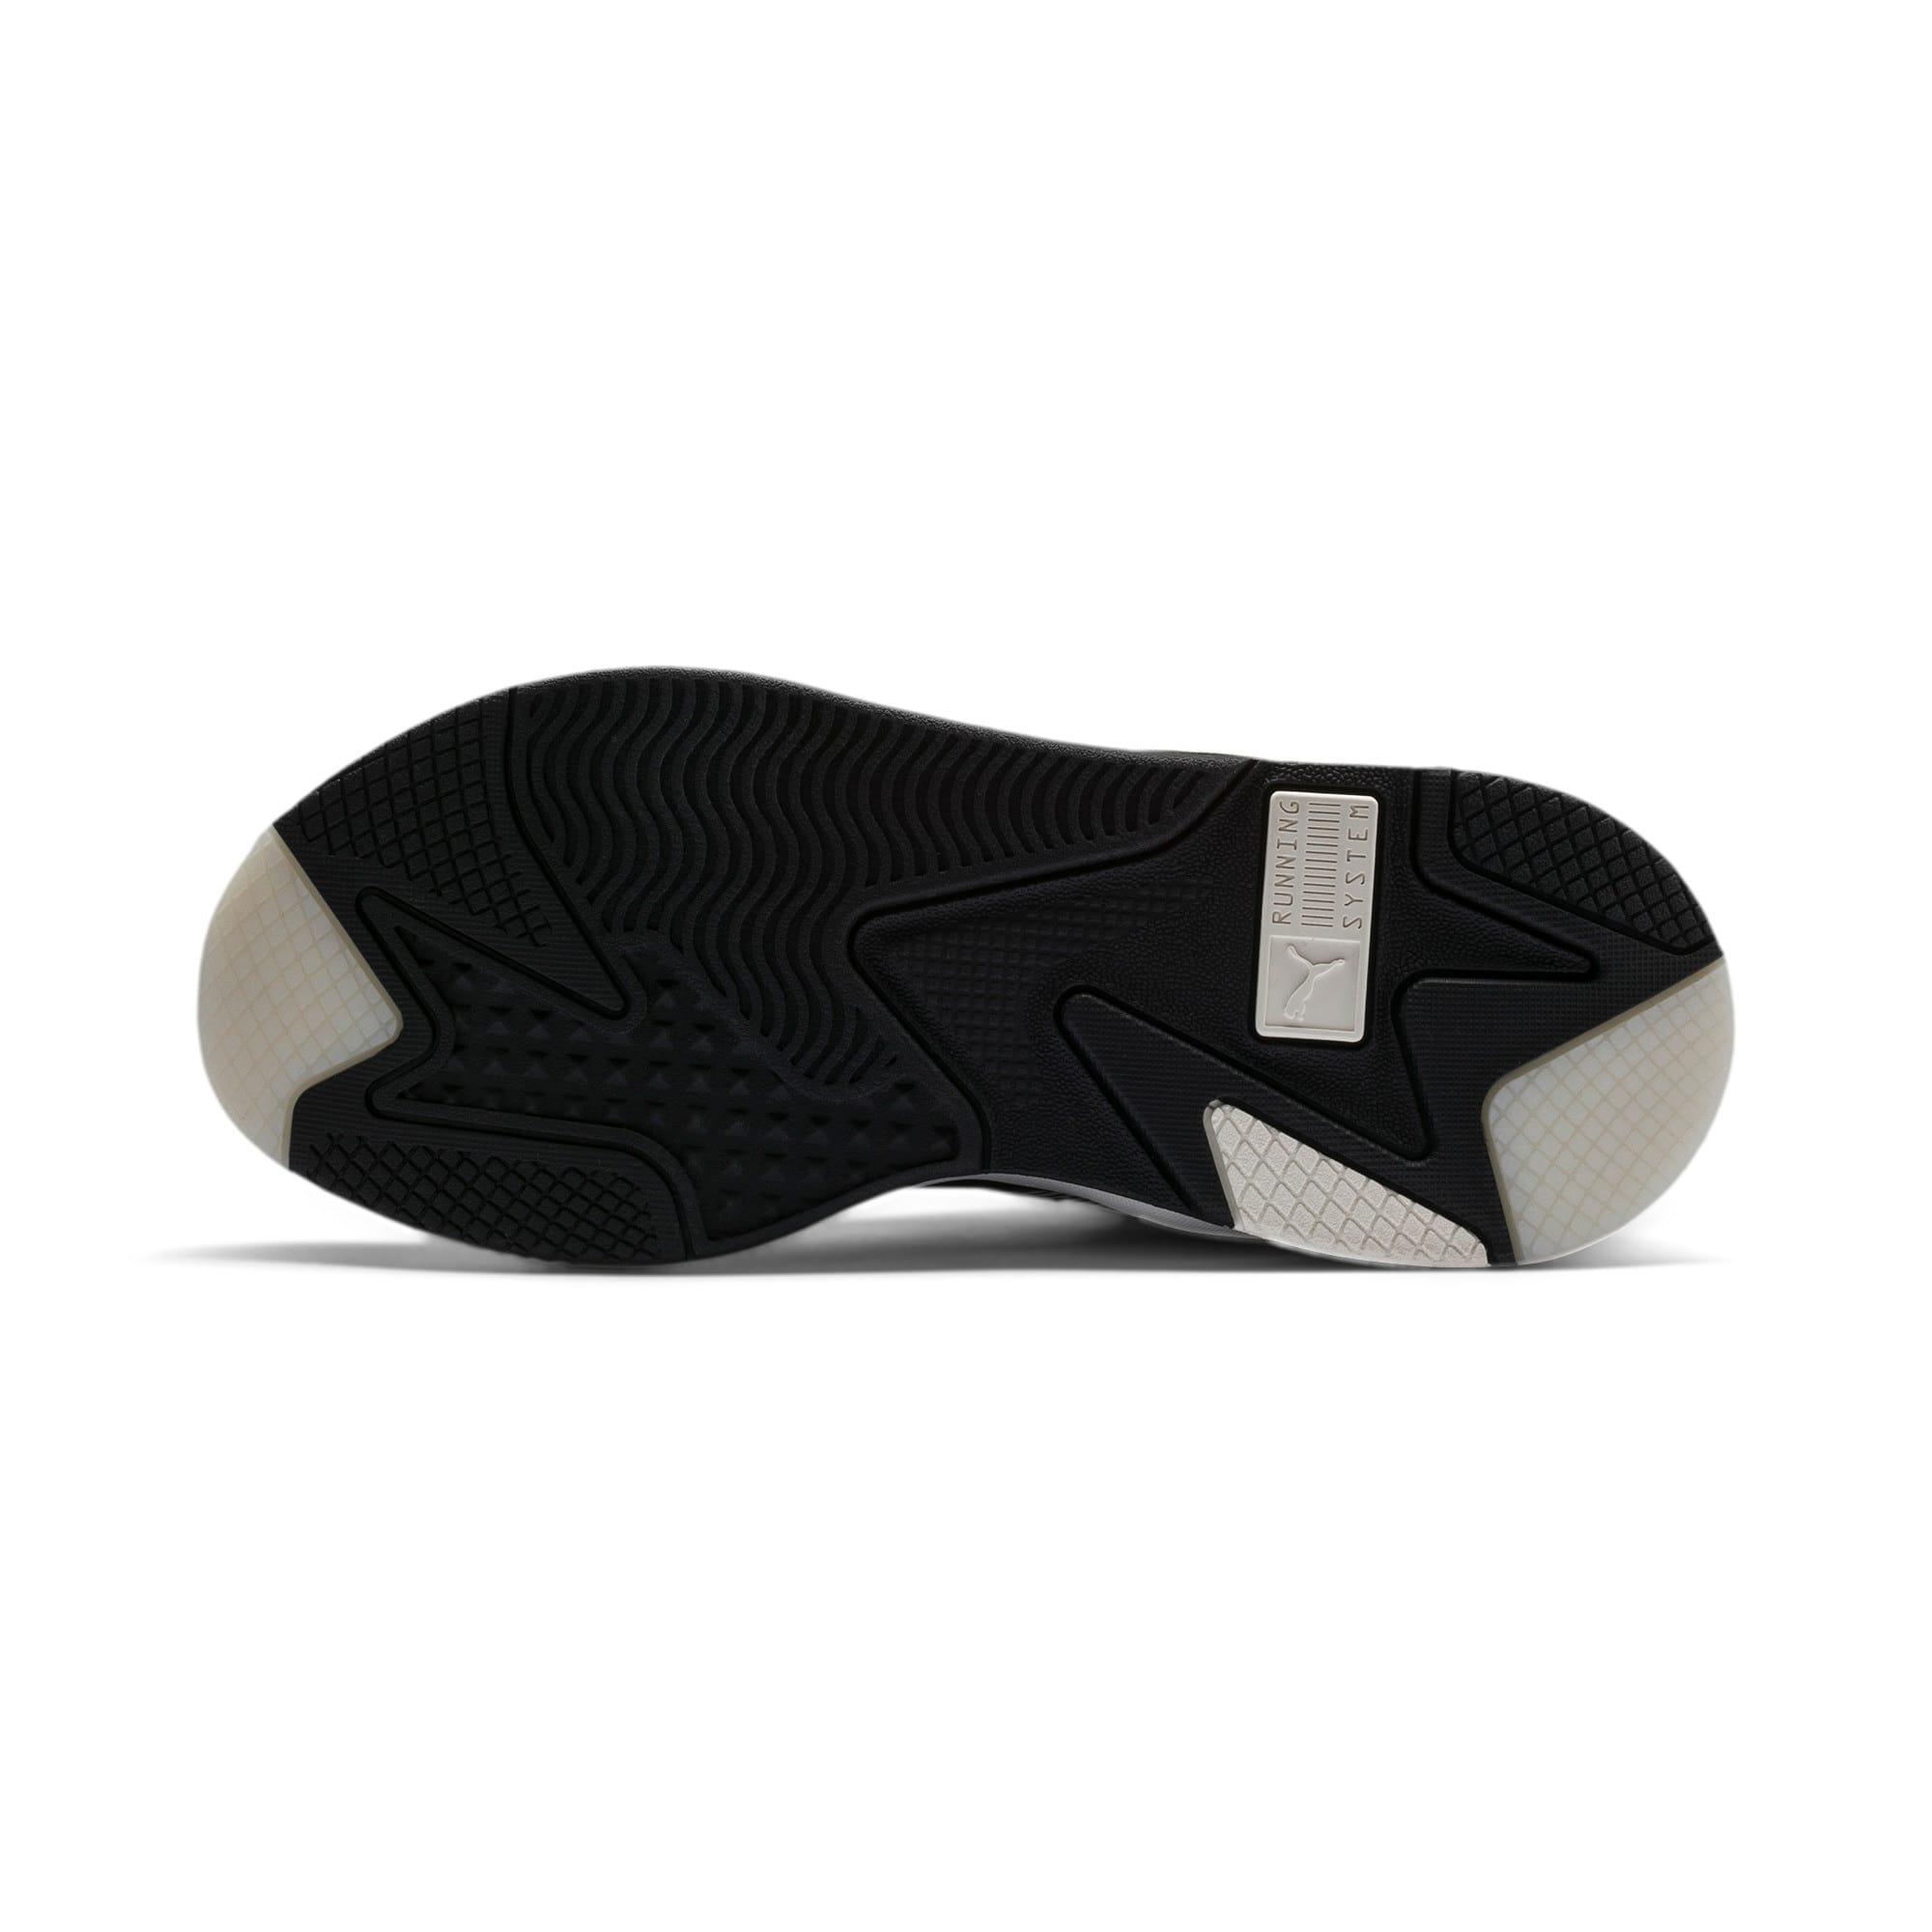 Thumbnail 5 of Basket RS-X Tech, Puma Black-Vaporous Gray, medium